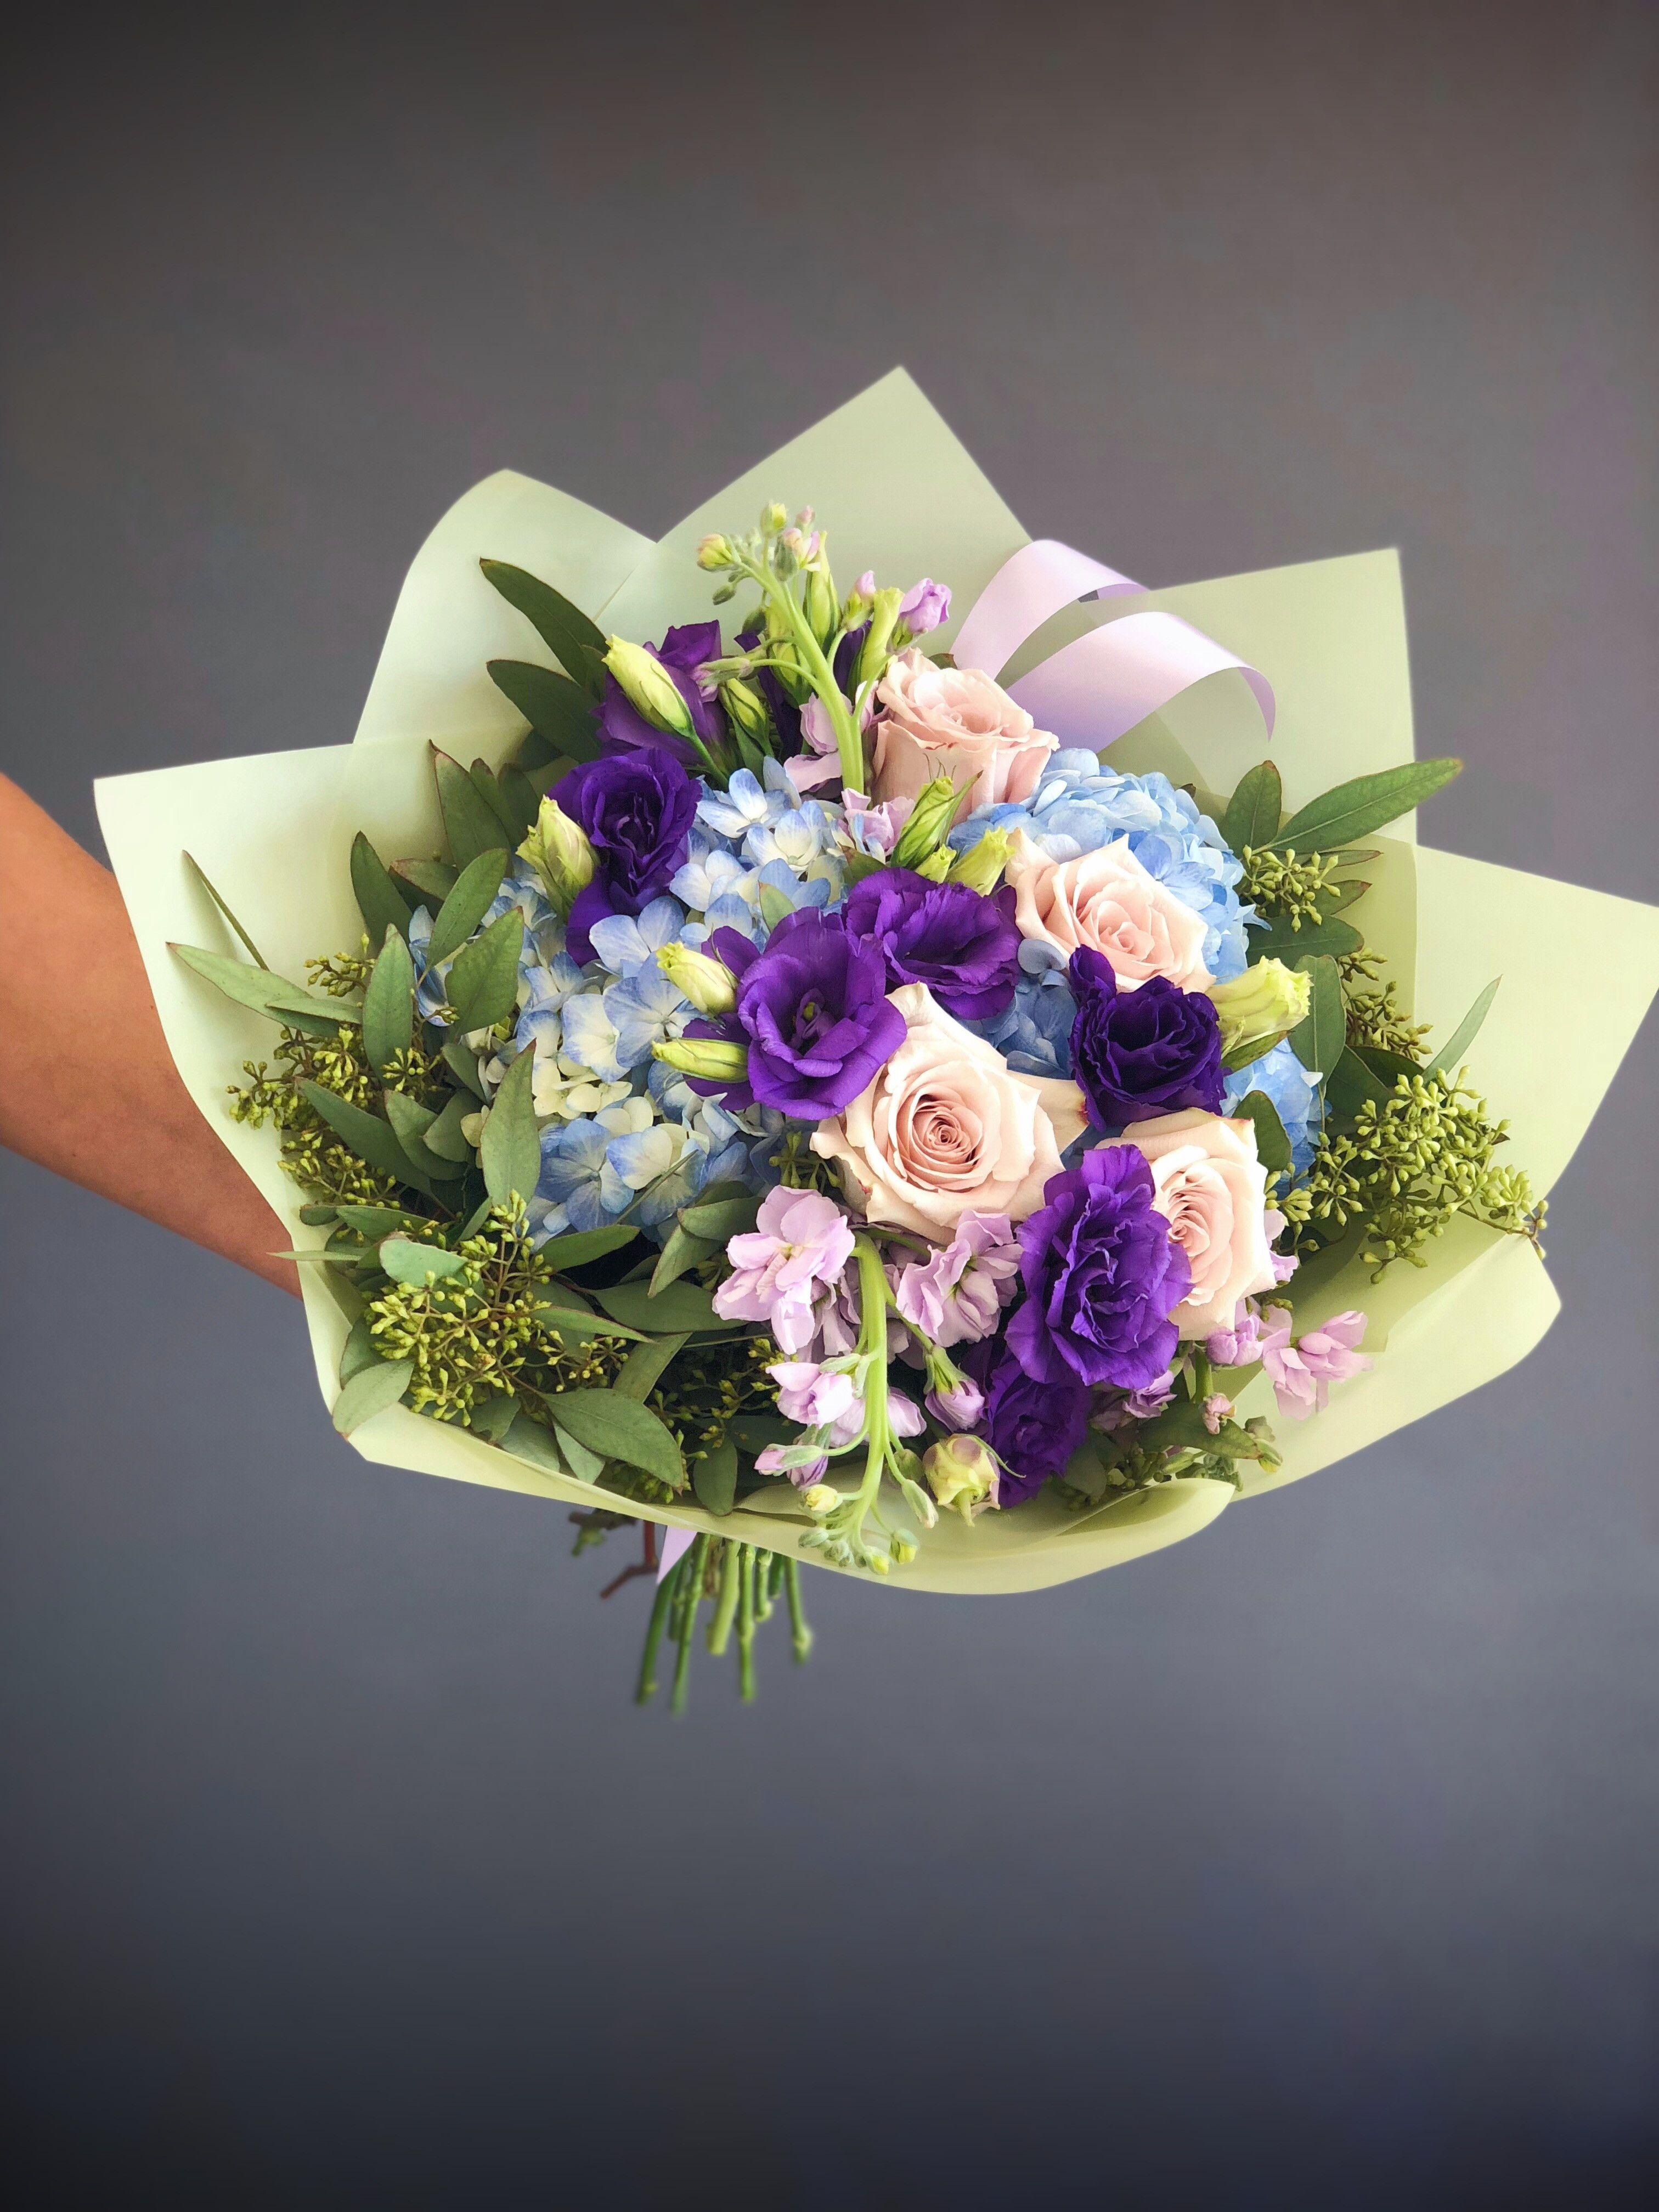 48 bouquet blue purple and sand colors small flores pinterest small bouquet with blue hydrangeas purple eustomas sand color roses and eucalyptus izmirmasajfo